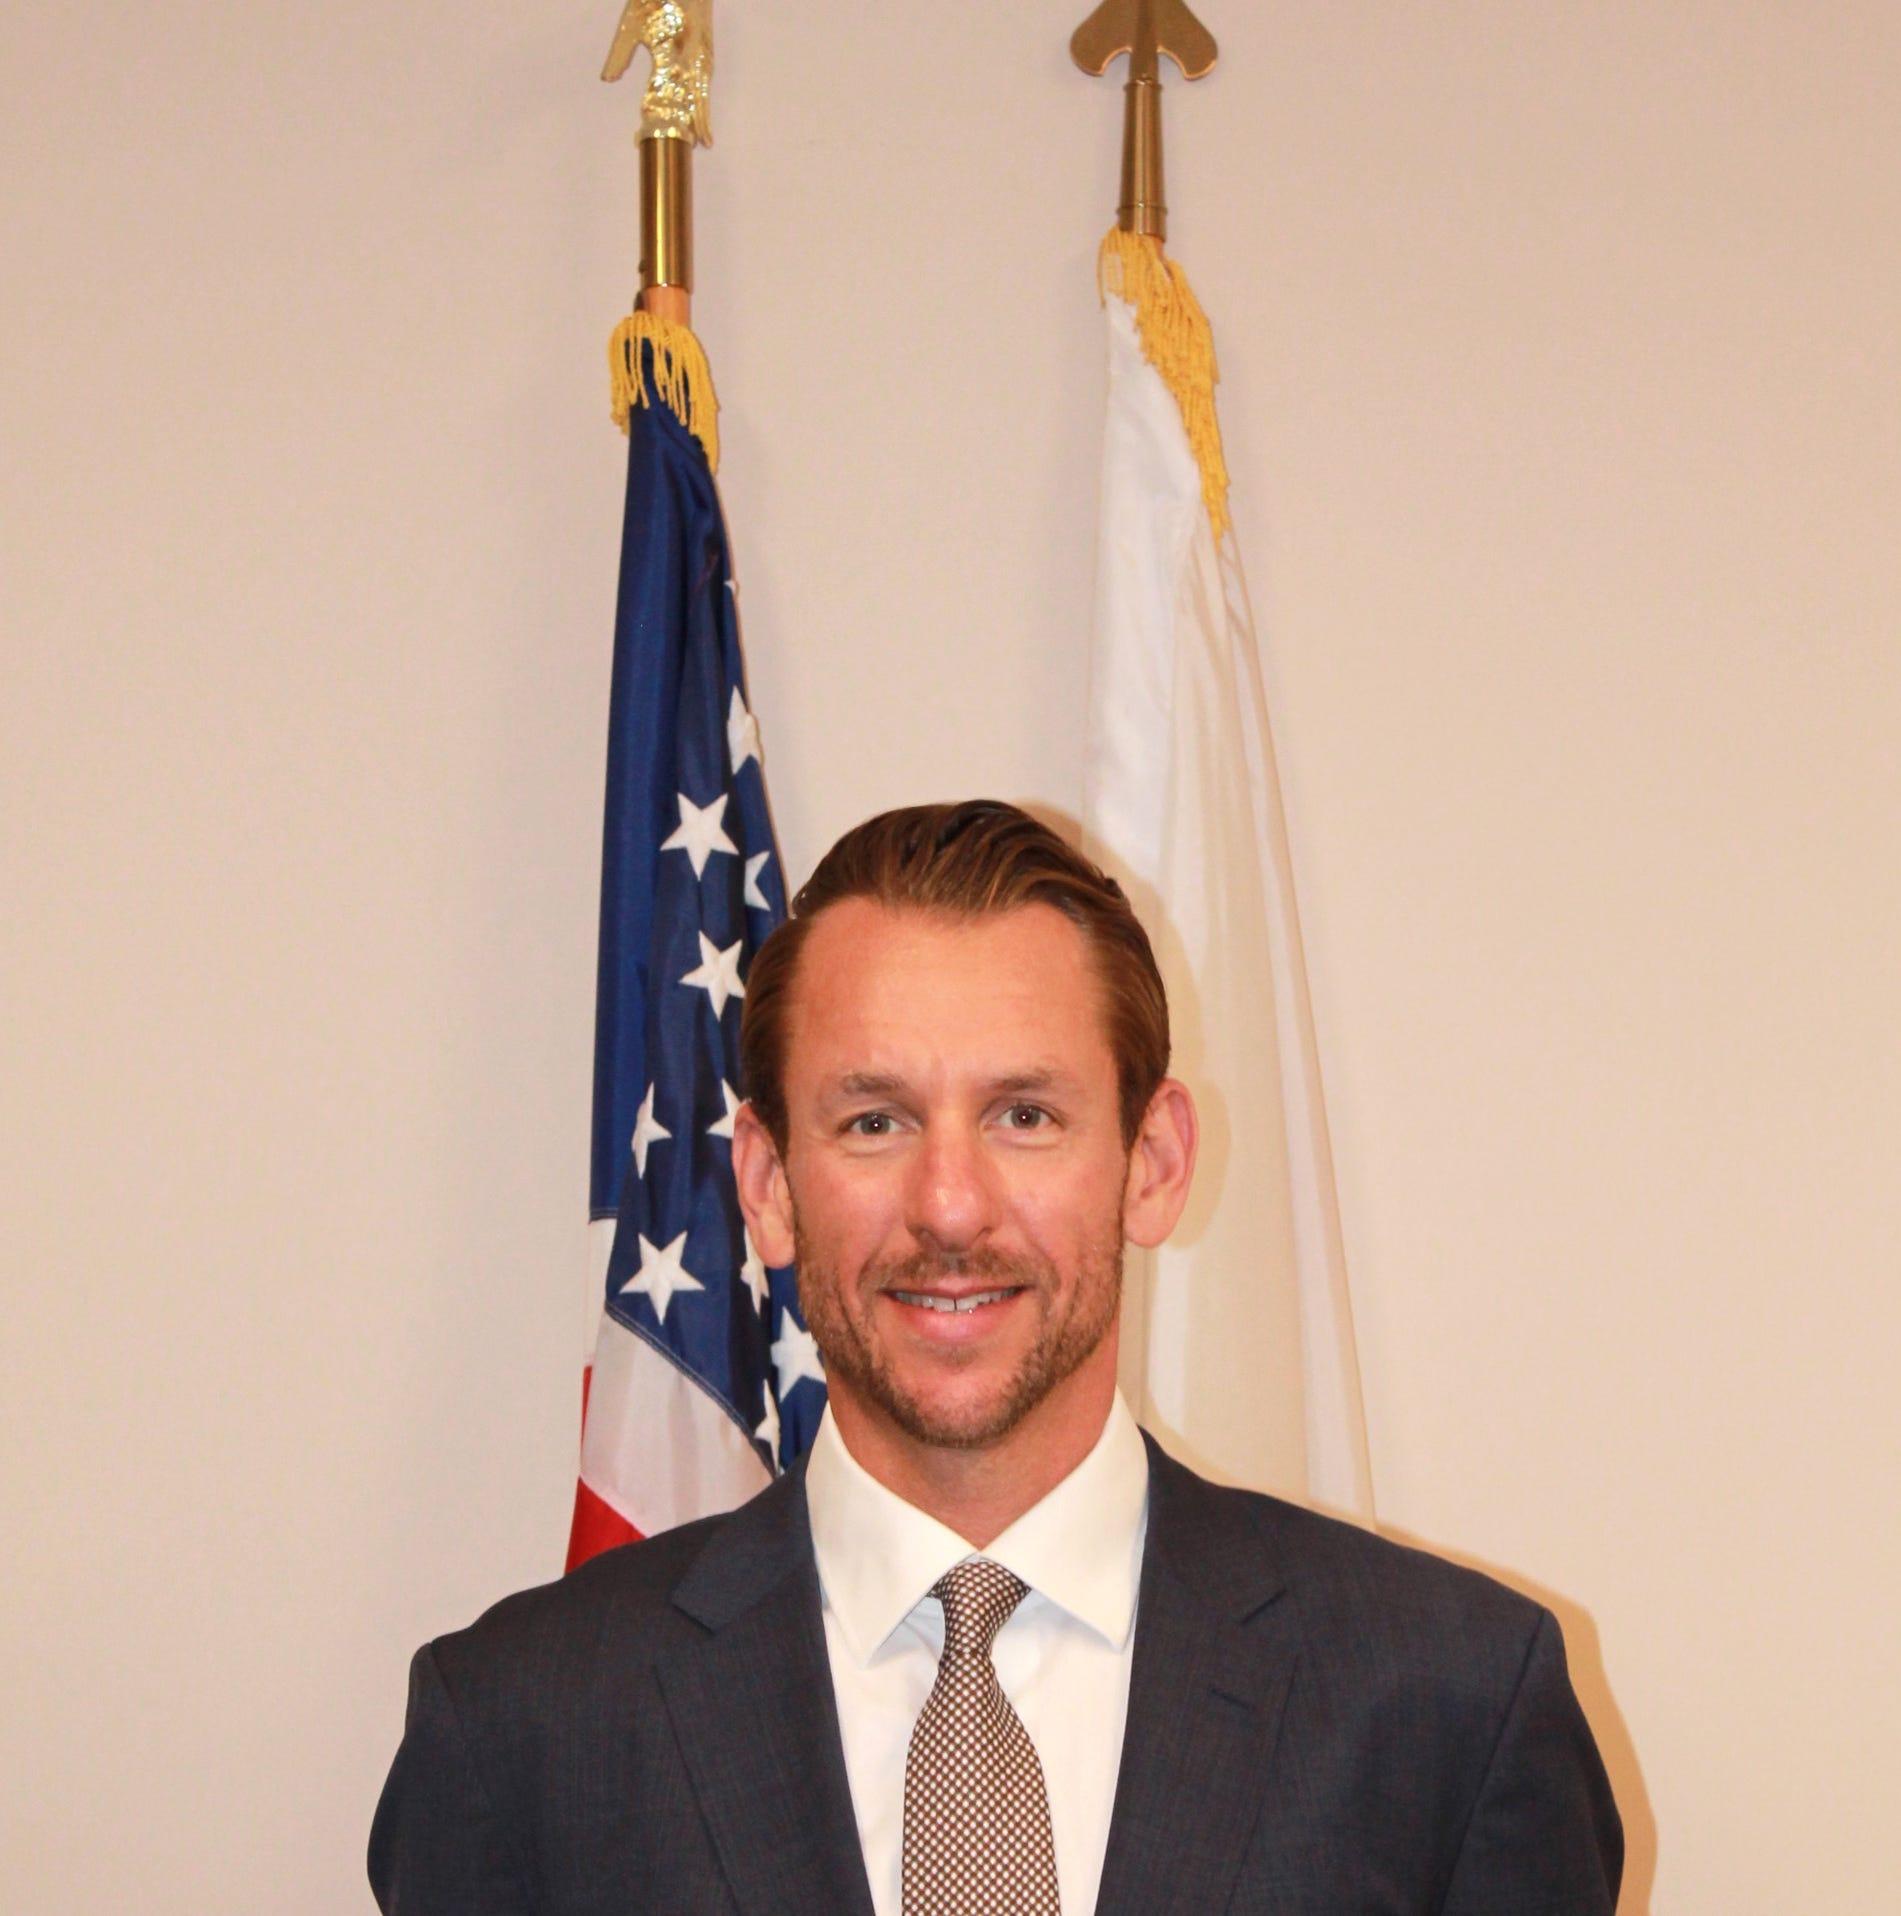 California Fair Political Practices Commission head hails from Camarillo